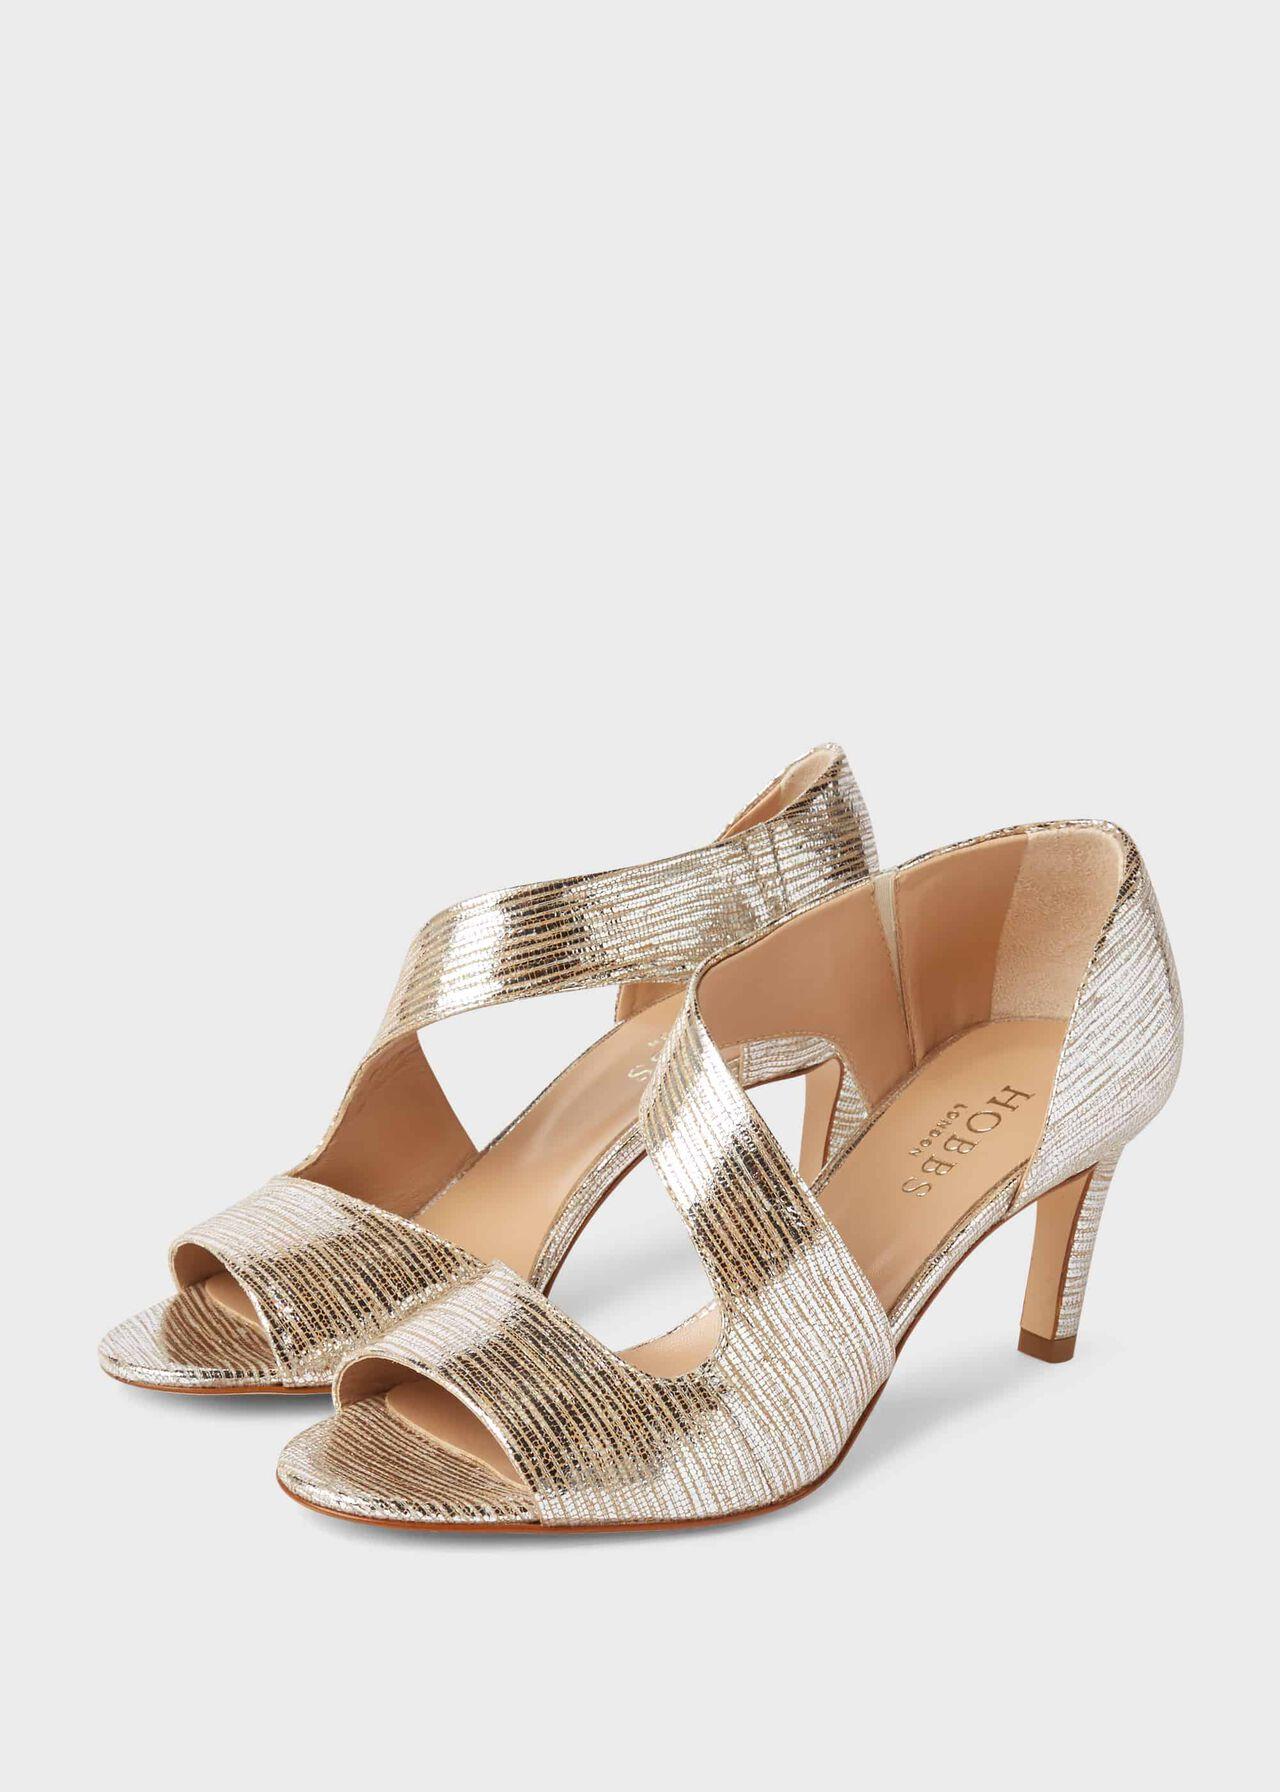 Lexi Sandal Metallic